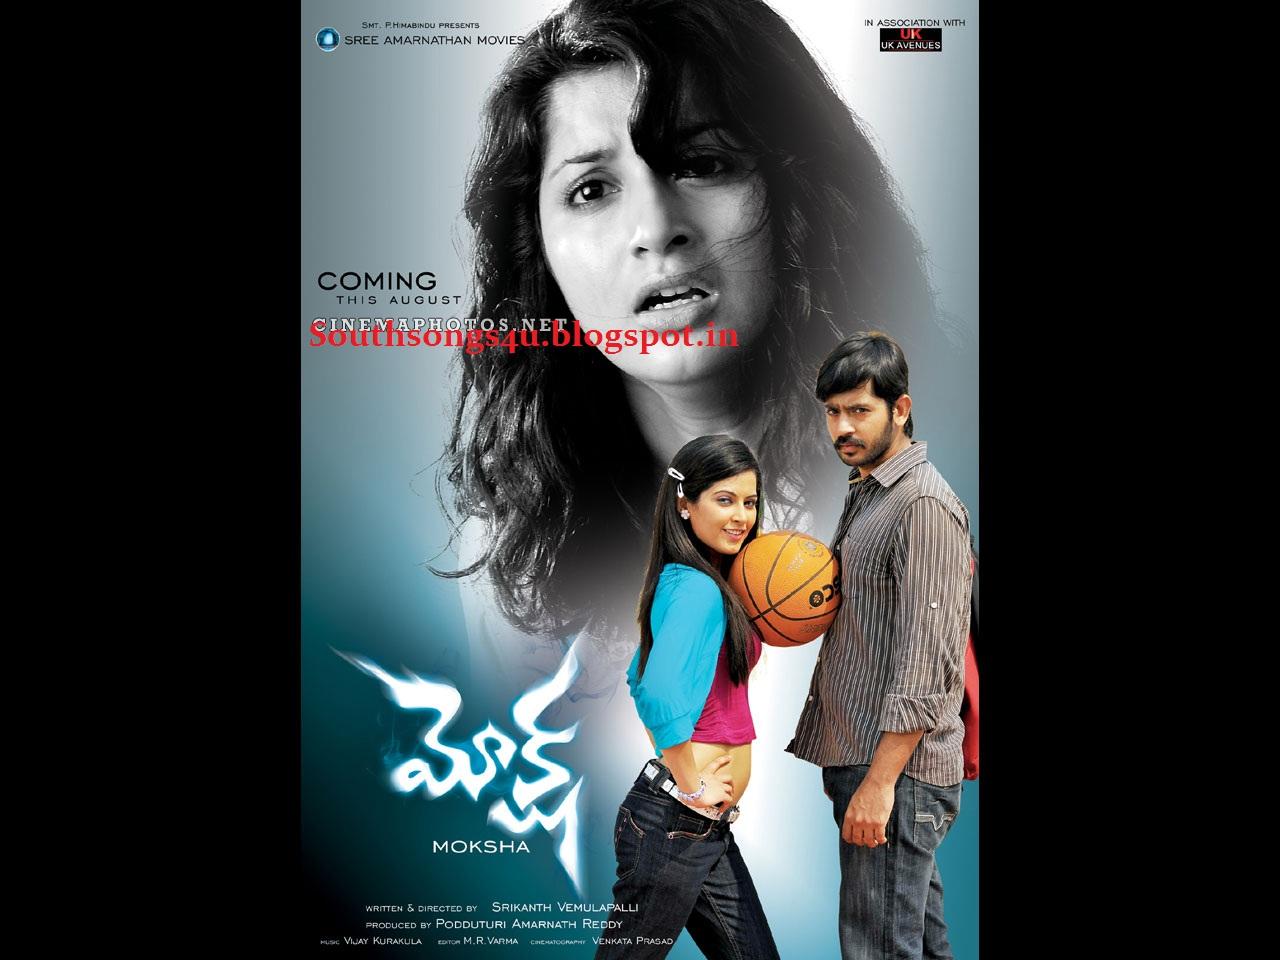 http://2.bp.blogspot.com/--cIXnKohQmE/UZYZkthvvUI/AAAAAAAAA-8/UdCT-qXE-LQ/s1600/moksha_telugu_Movie_wallpapers_006.jpg